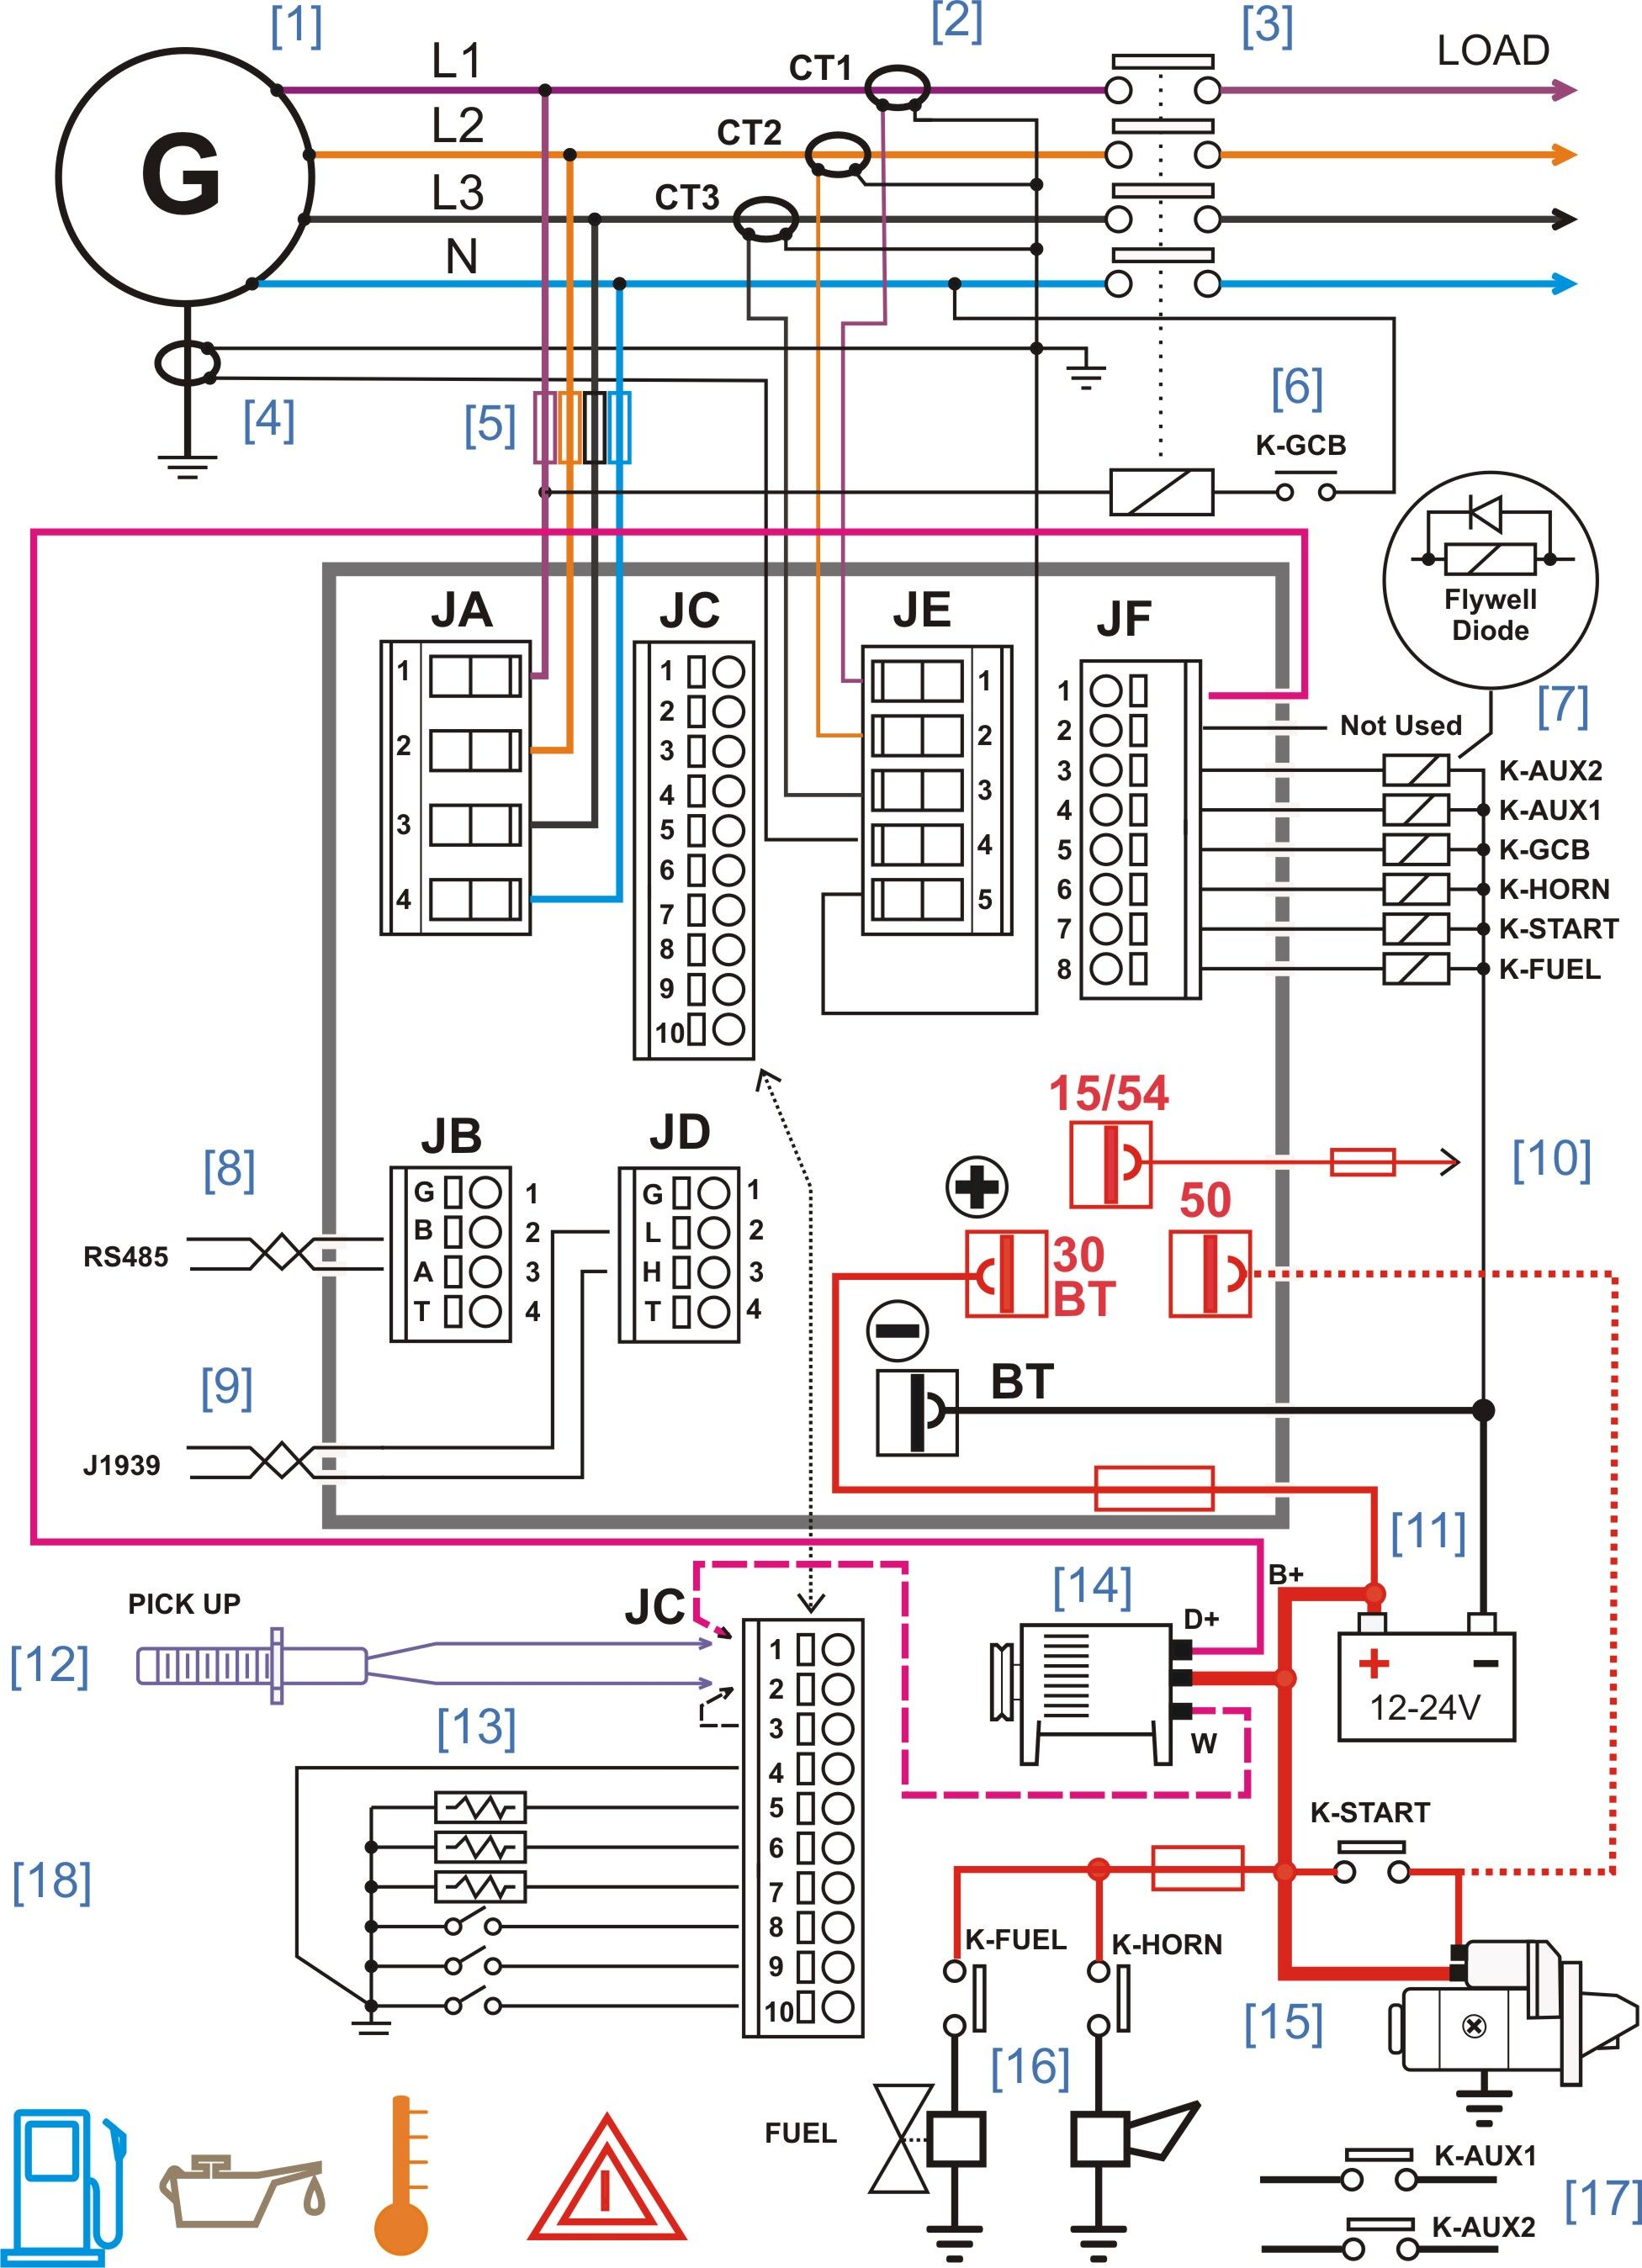 electrical panel wiring diagram symbols